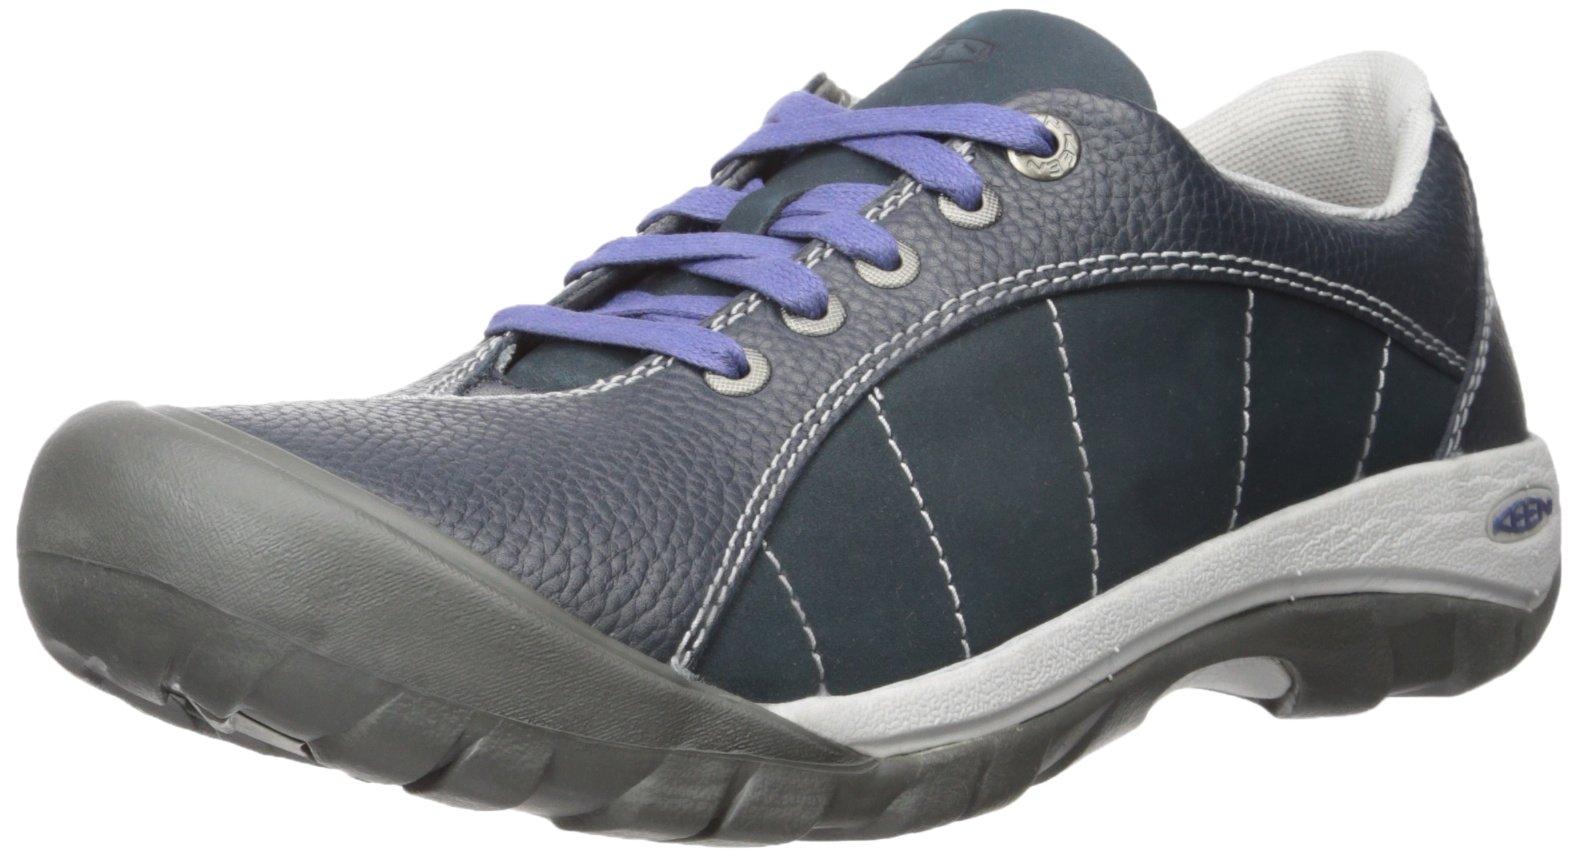 KEEN Women's Presidio Hiking Shoe, Blueberry, 9.5 M US by KEEN